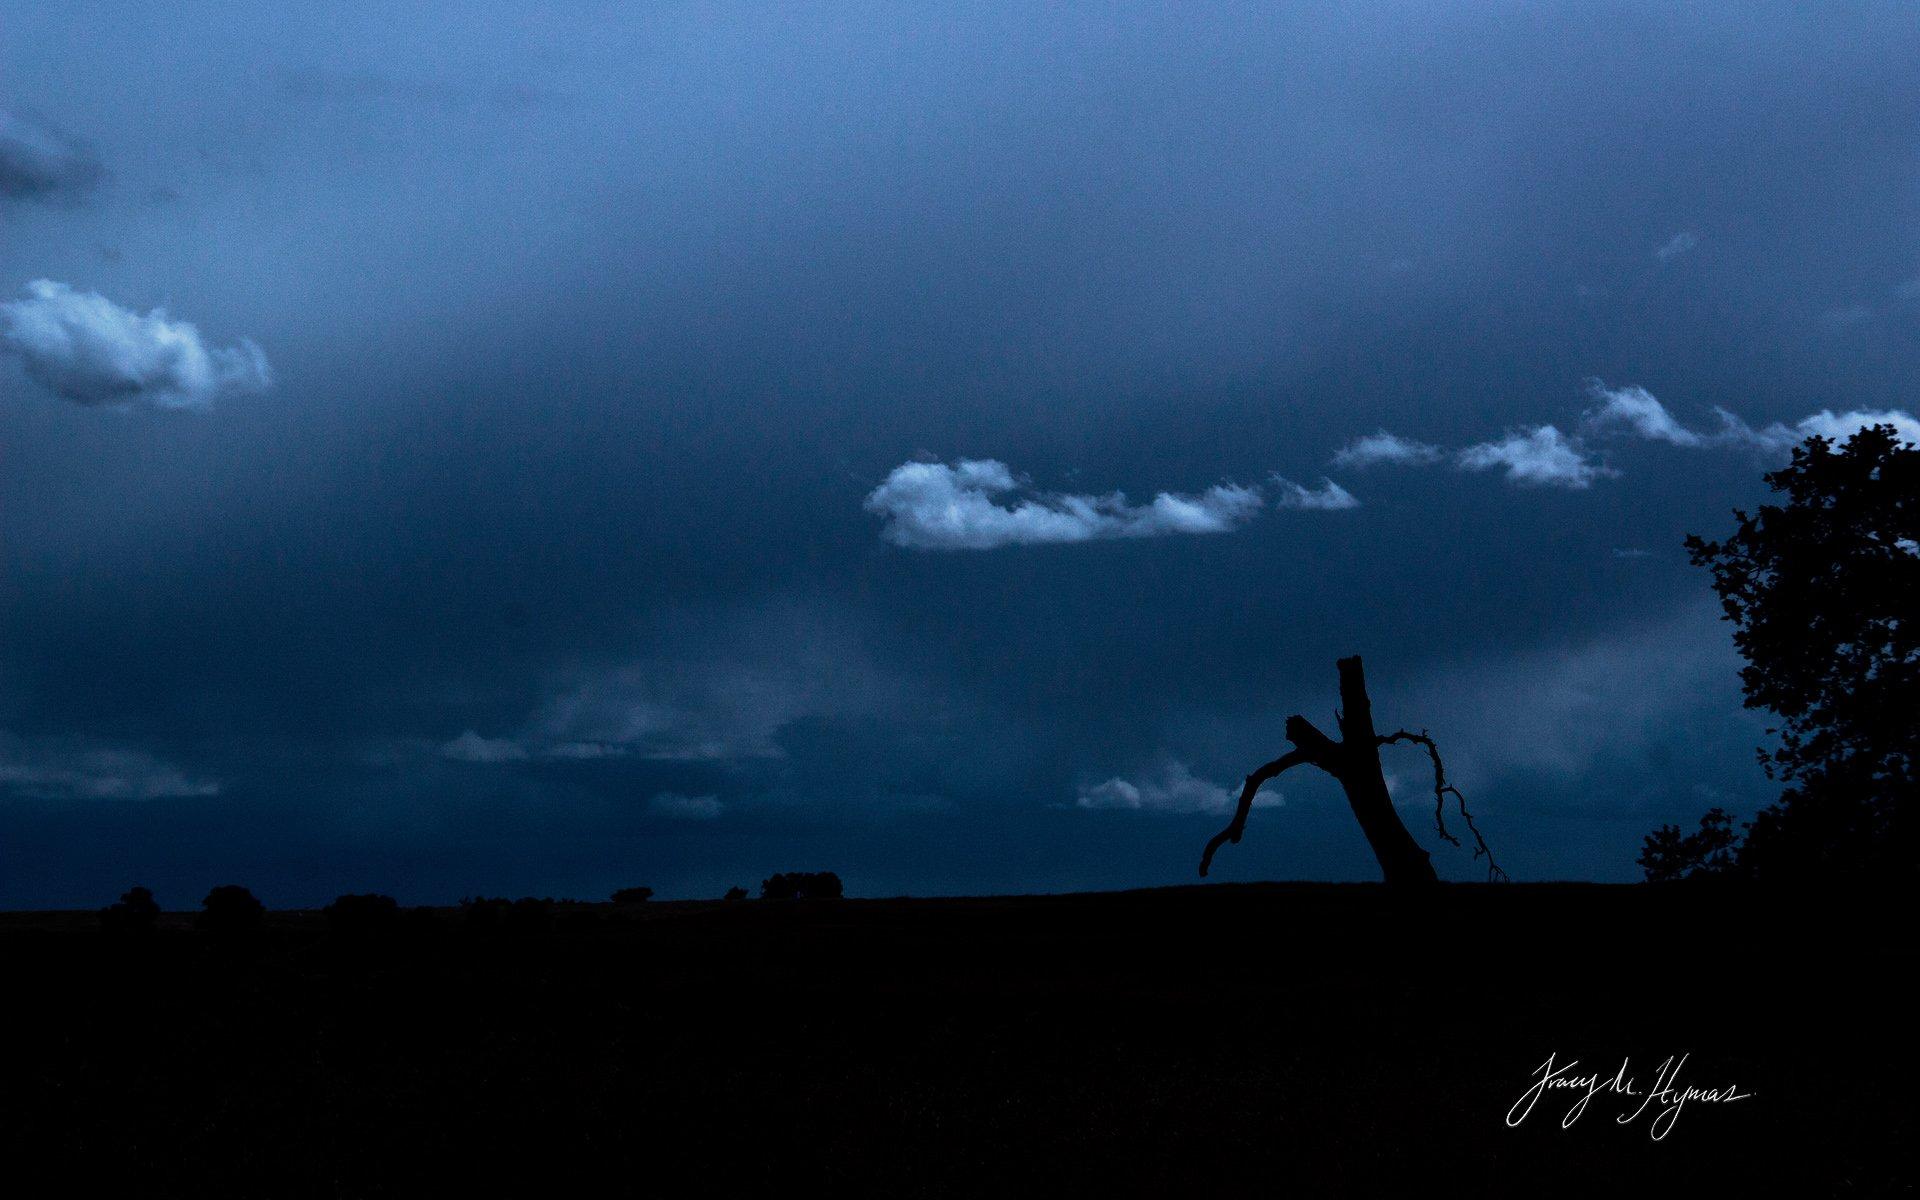 Dark skies silhouette photo